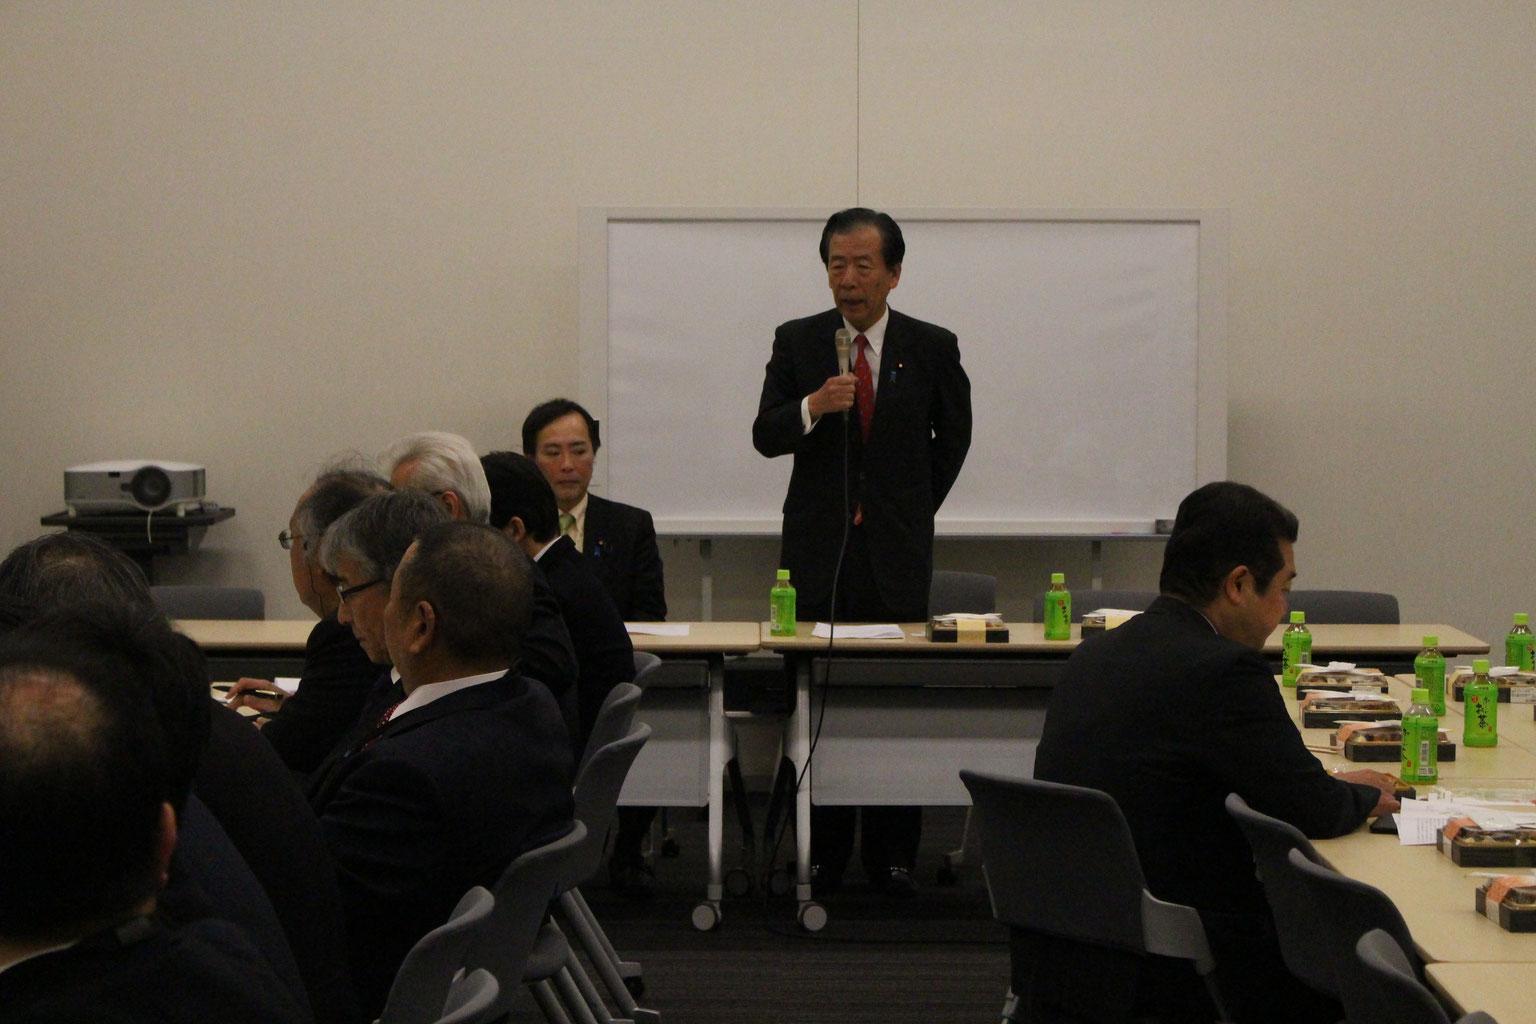 交通運輸政策研究会(議員懇談会)の総会を開く